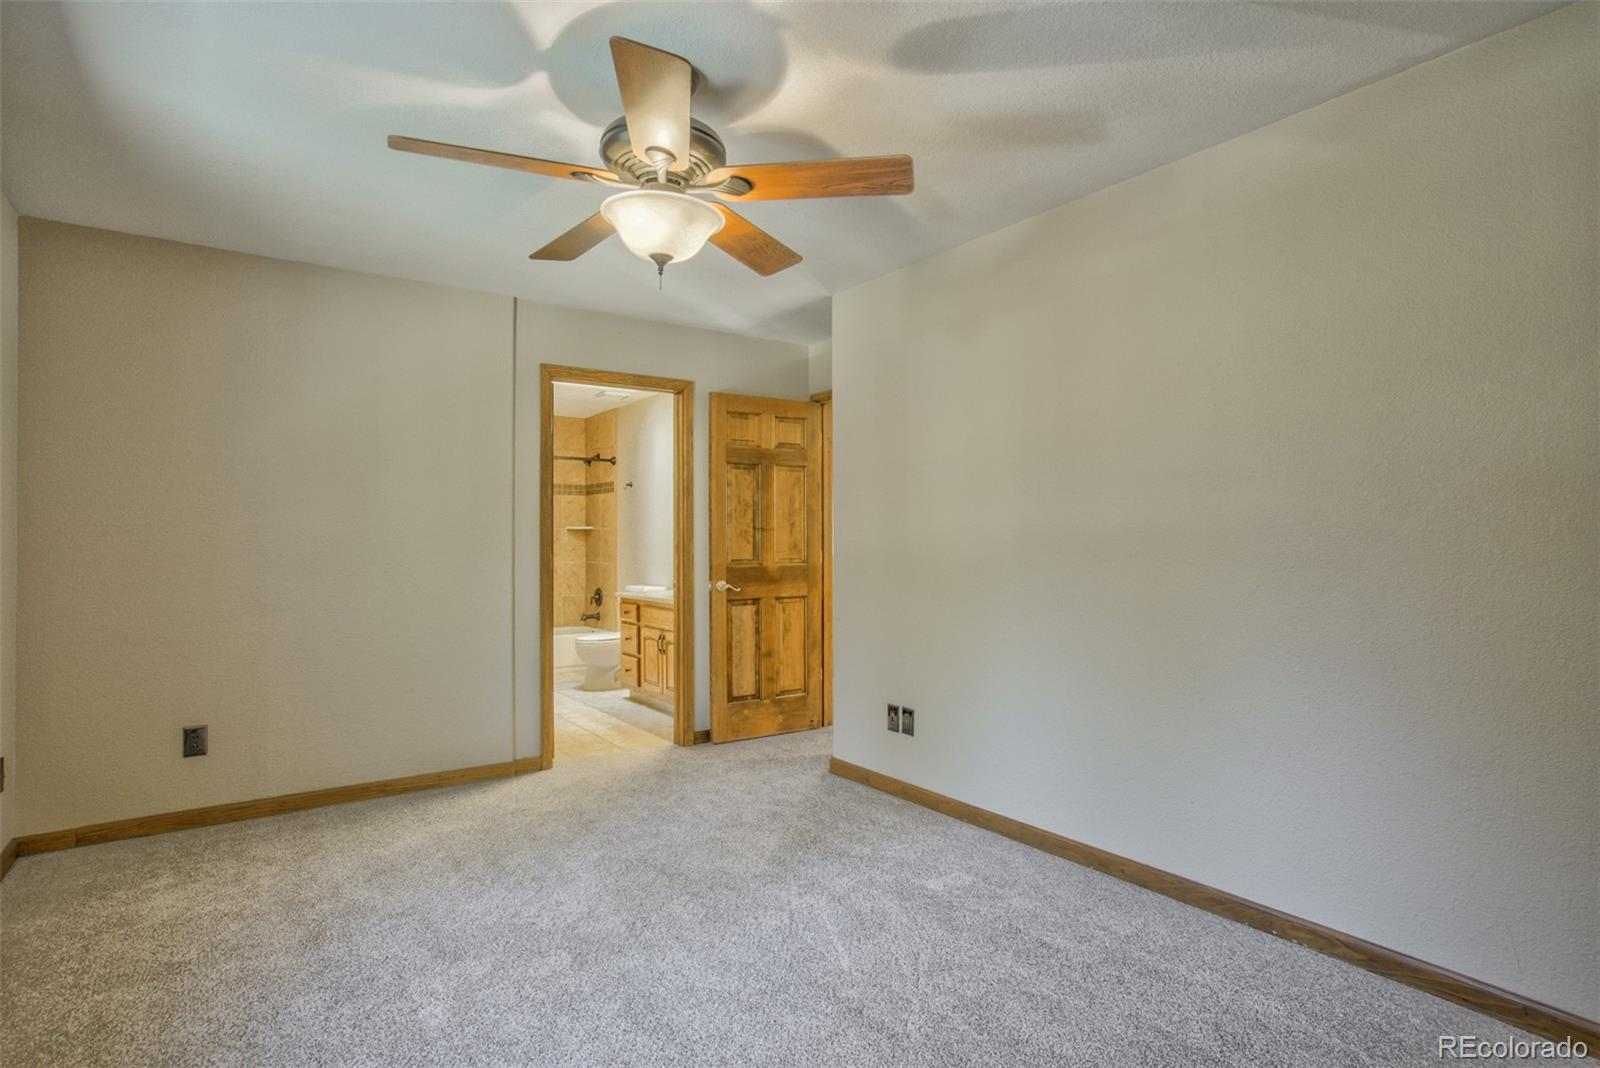 MLS# 2707350 - 33 - 17310 Charter Pines , Colorado Springs, CO 80132